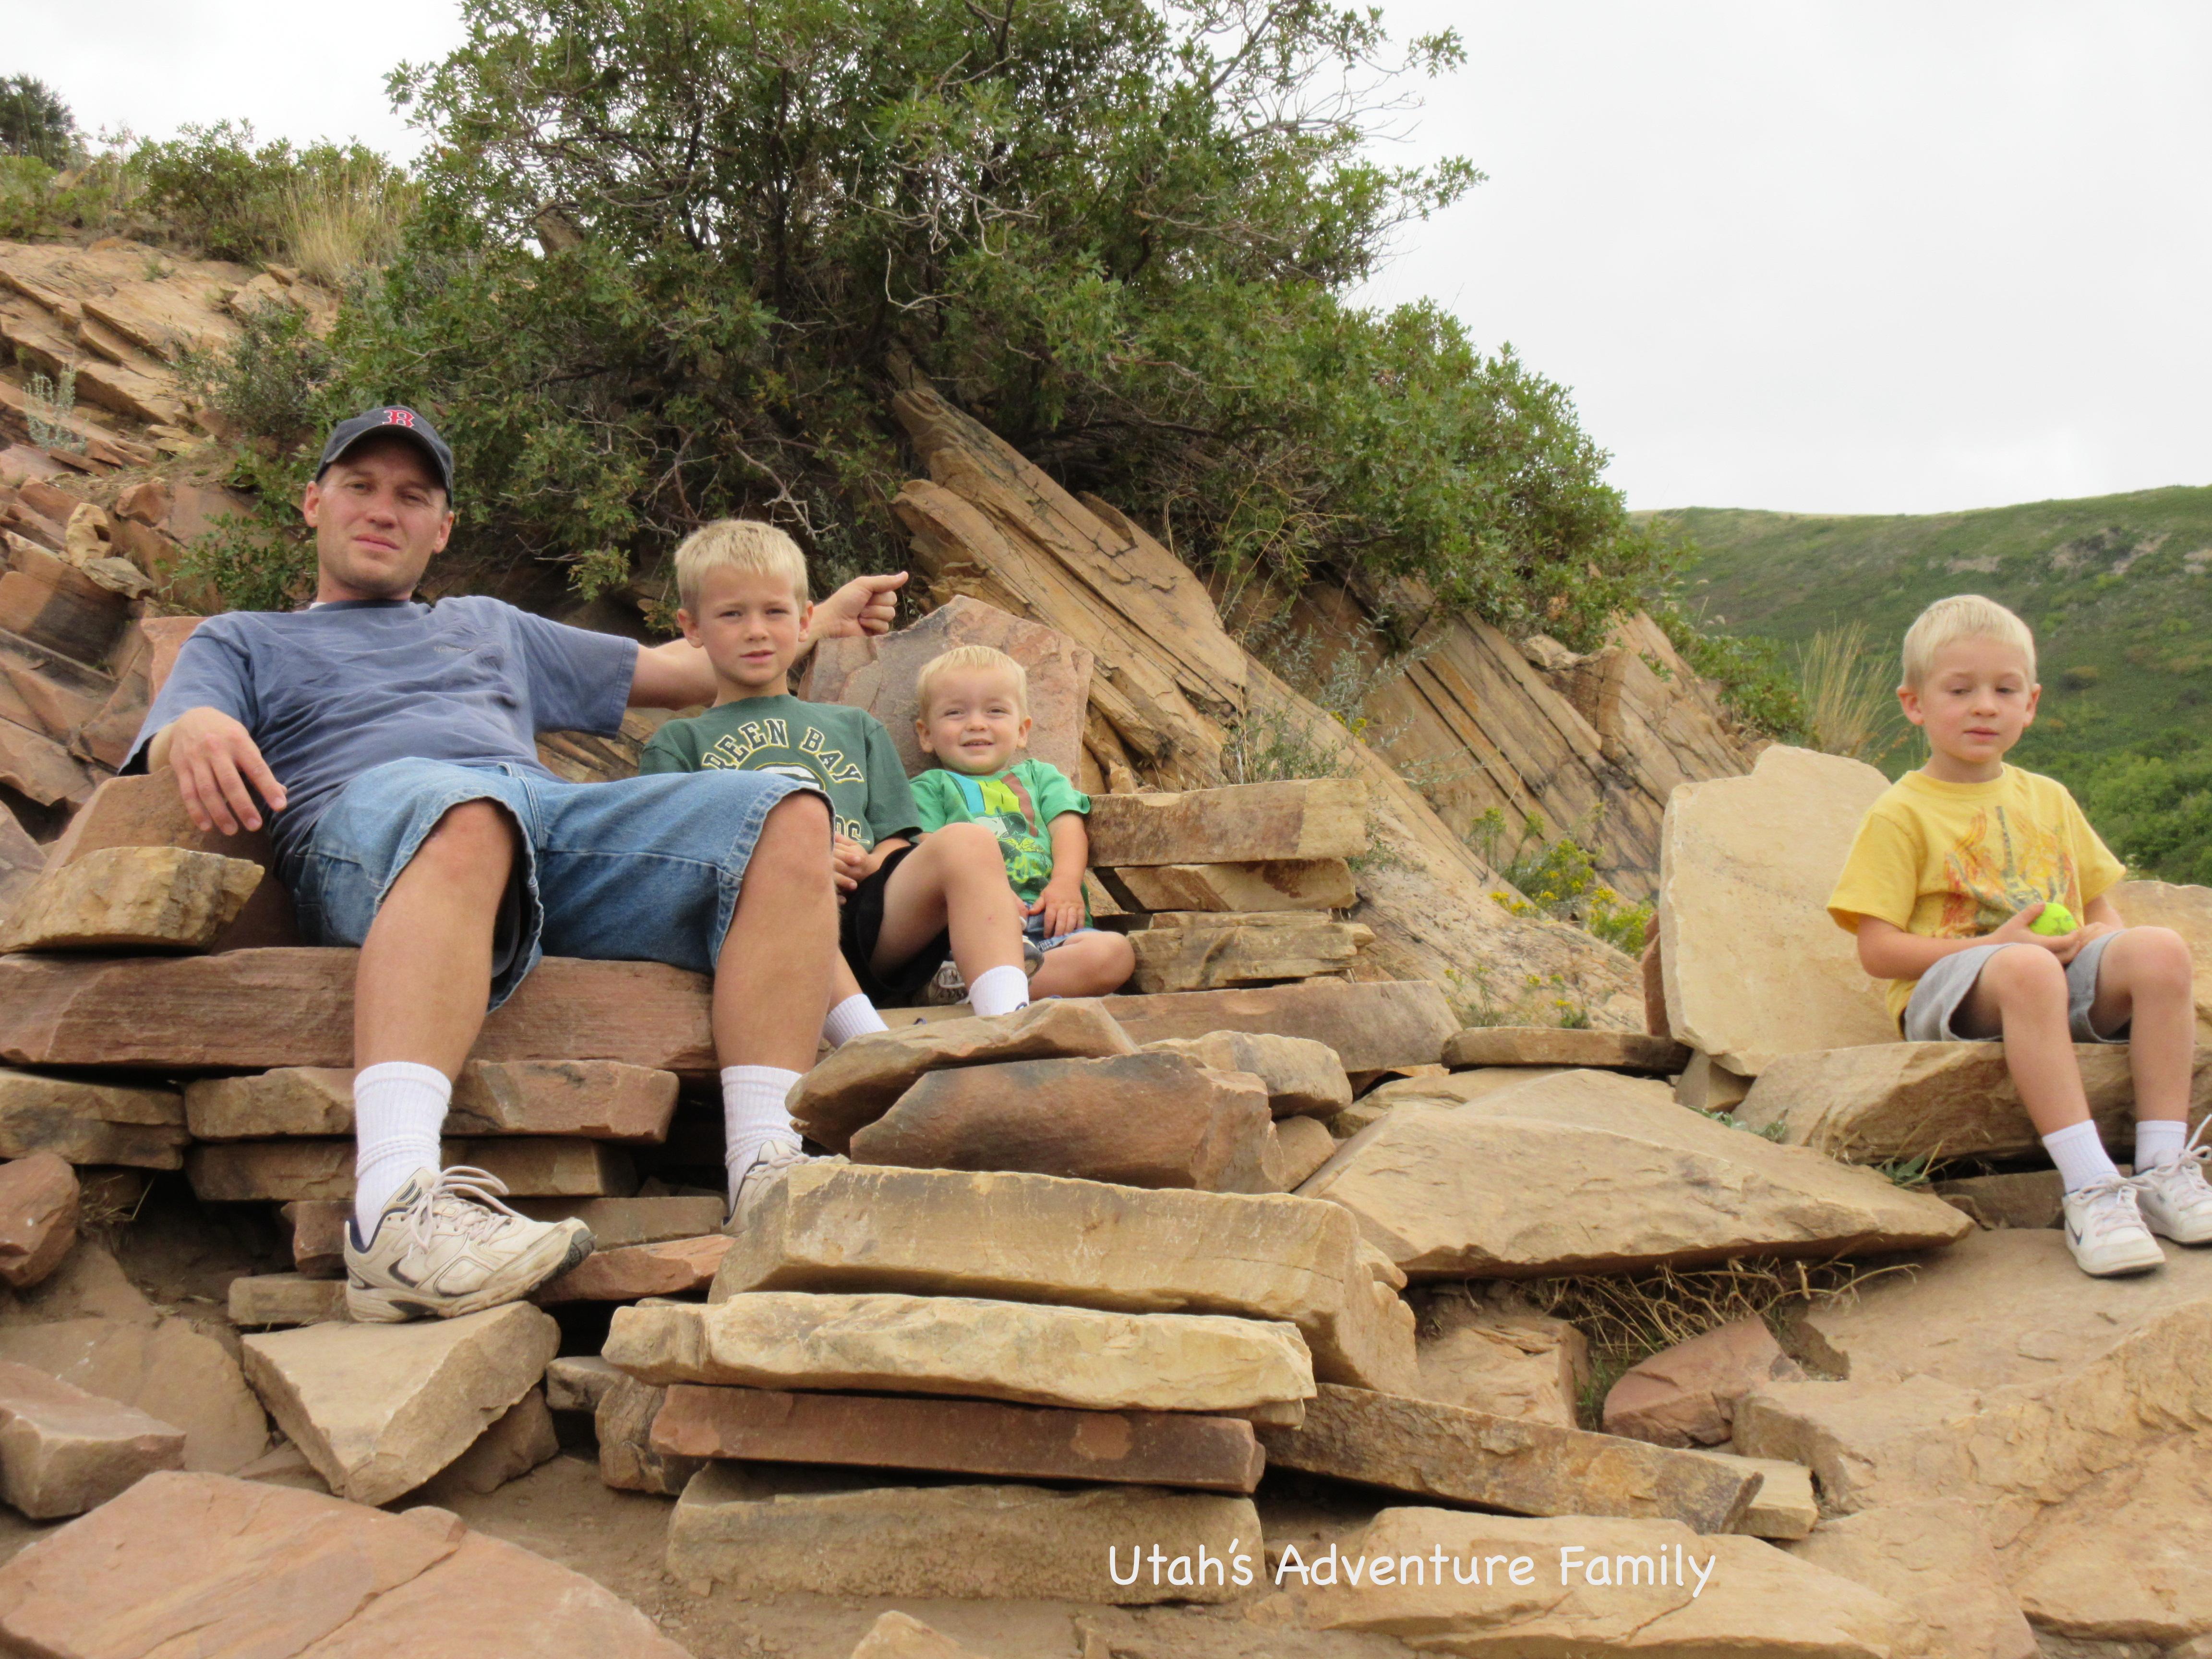 Utahu0027s Adventure Family